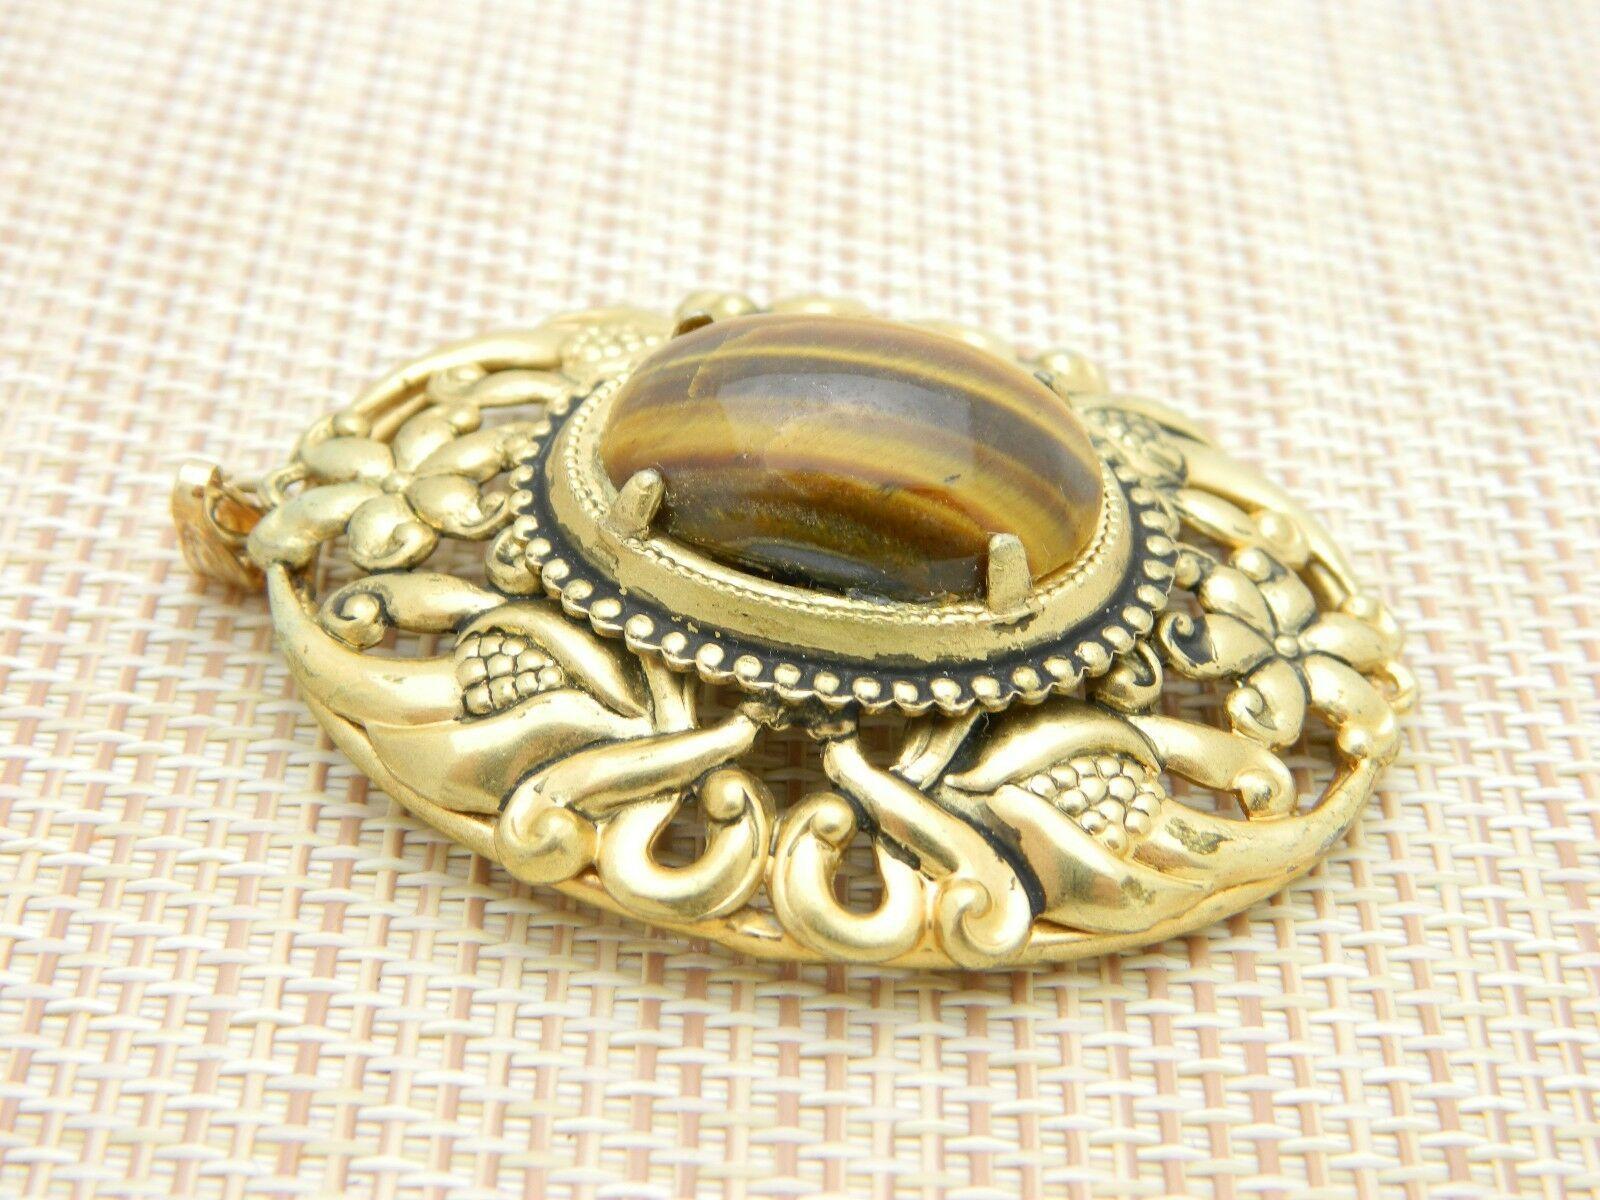 Tiger's Eye Gold Tone Repousse Necklace Pendant Vintage image 2